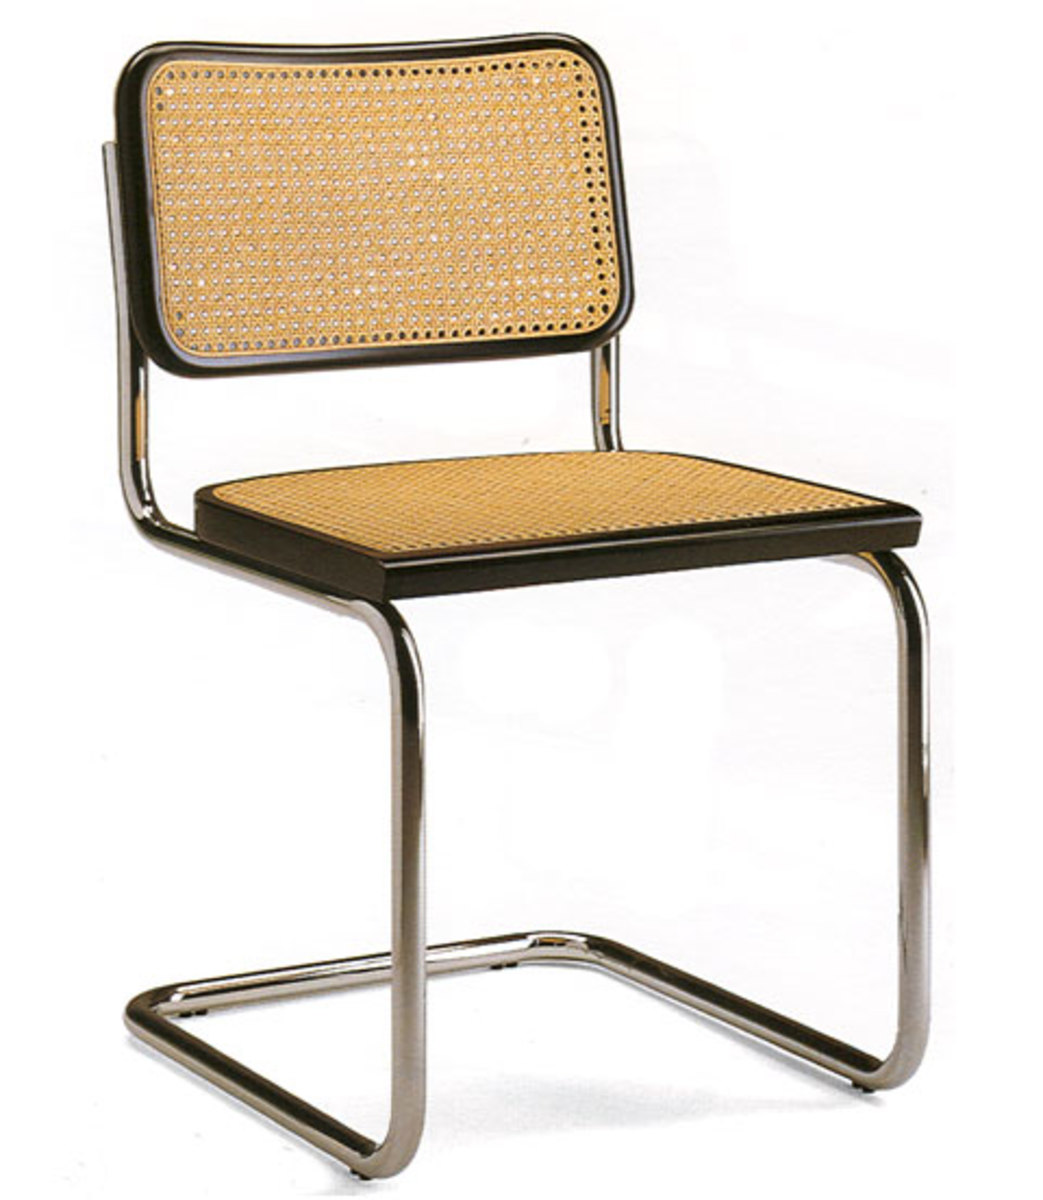 Marcel Breuer Cane Chair & Tubular Steel